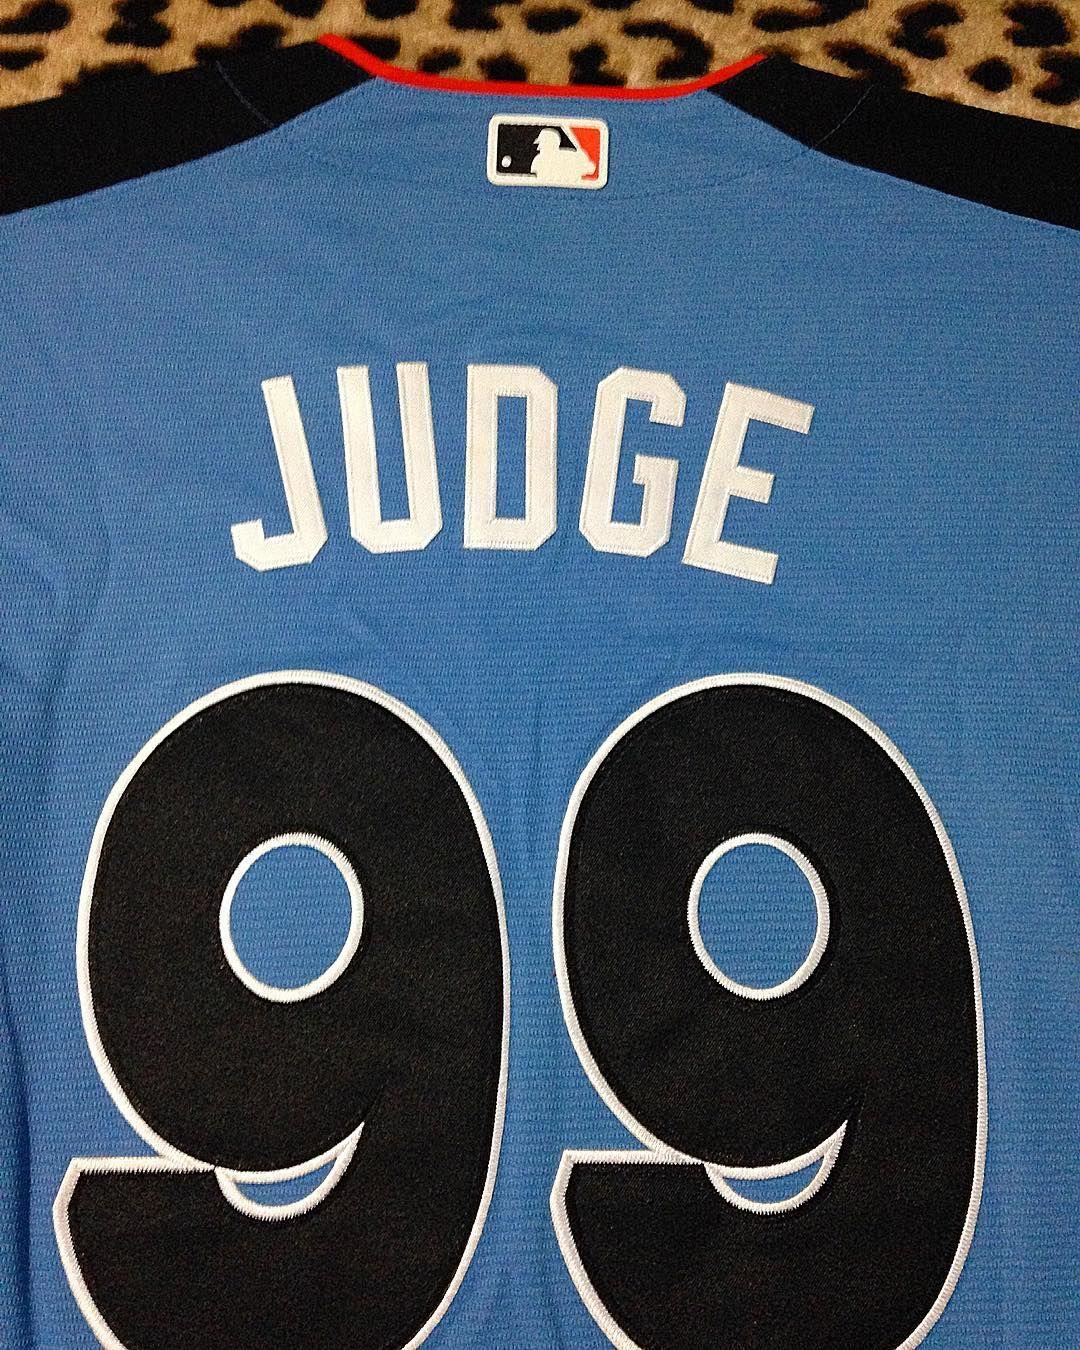 1076bce55d6ba Camisa ALLSTAR GAME NY YANKEES  17000 tamanho M  mlb  yankees  allstargame   allstargamemiami2017  Judge